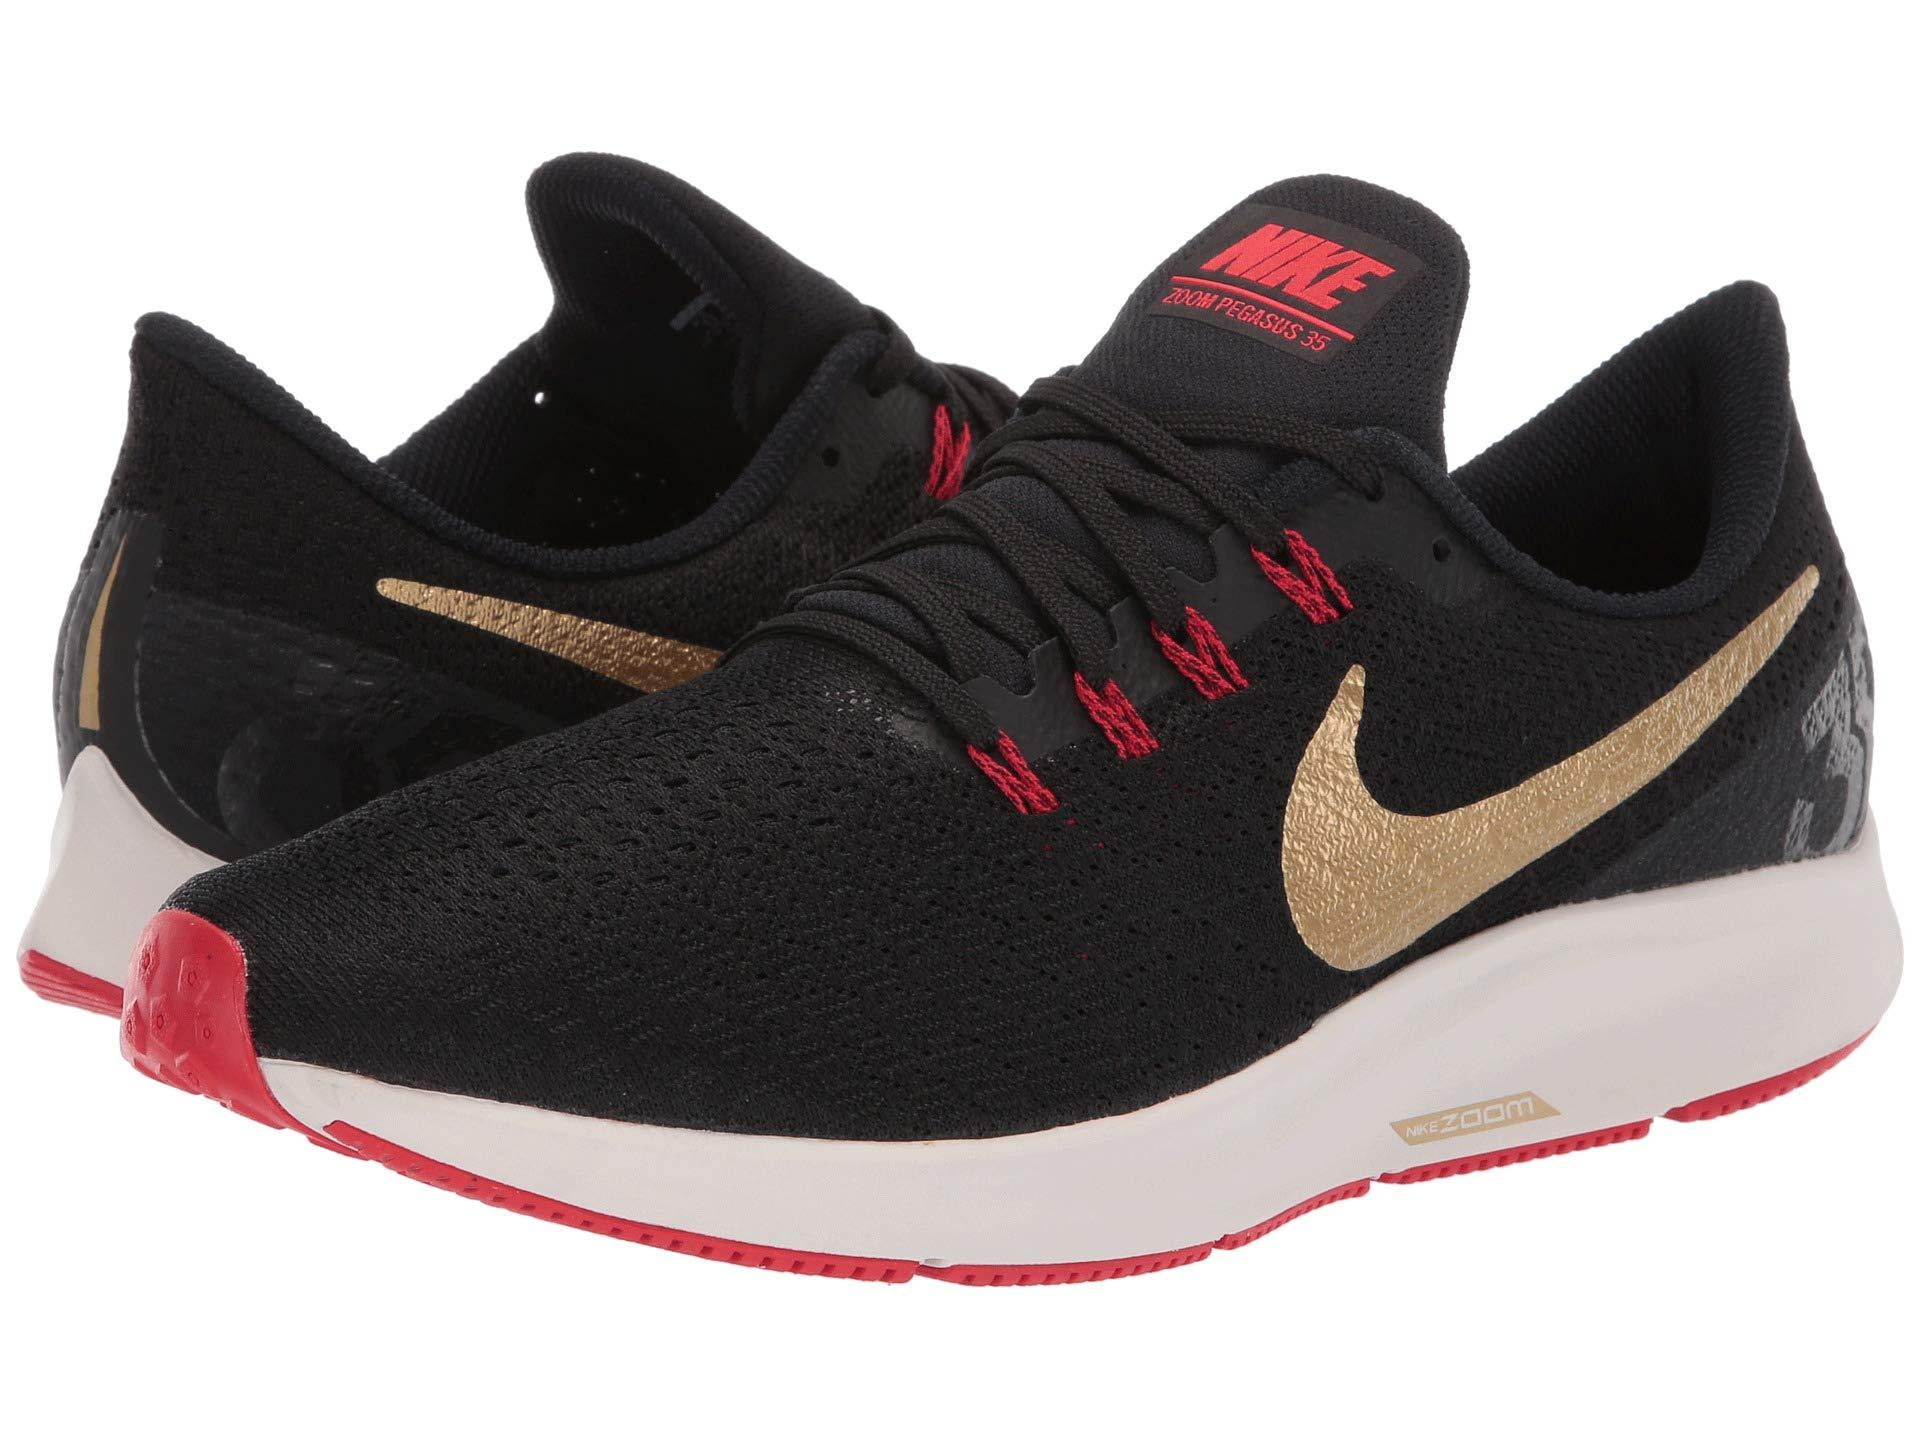 d9dbce991195 Nike. Metallic Air Zoom Pegasus 35 (light Silver dark Stucco twilight  Marsh) Men s Running Shoes